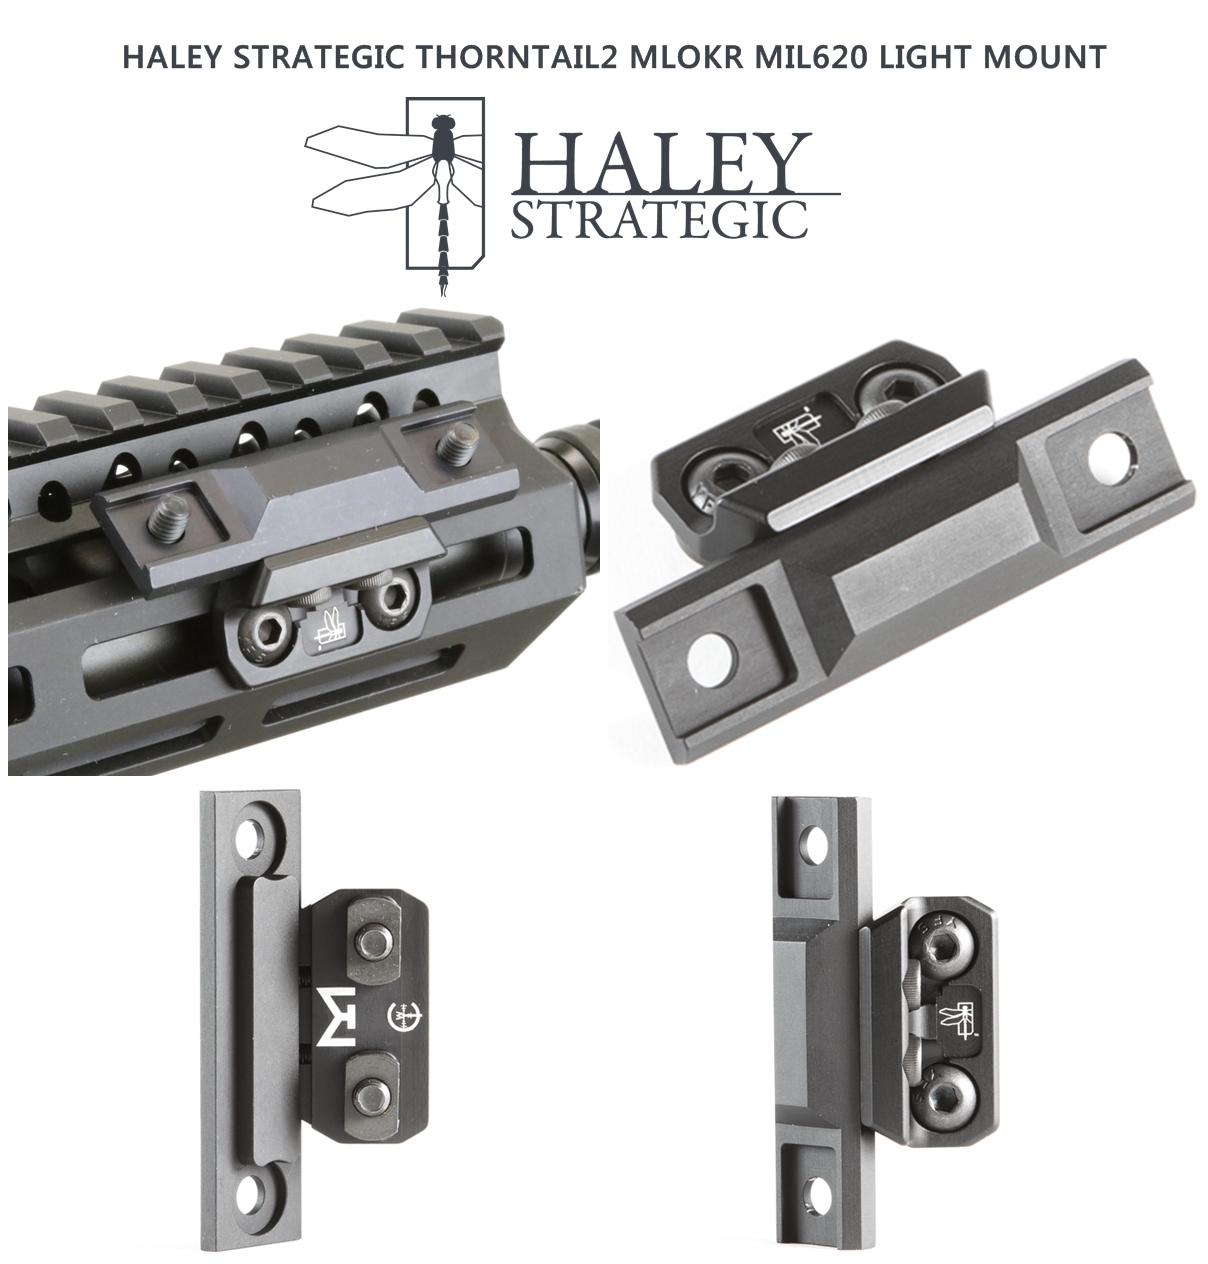 21 SUREFIRE M952V TYPE & HALEY STRATEGIC TYPE PICATINNY LIGHT MOUNT & M-LOK MAGPUL PTS Enhanced Rail Section ERS 3 オフセット セッティング カスタム 購入 開封 取付 分解 実物 レプリカ 比較 レビュー